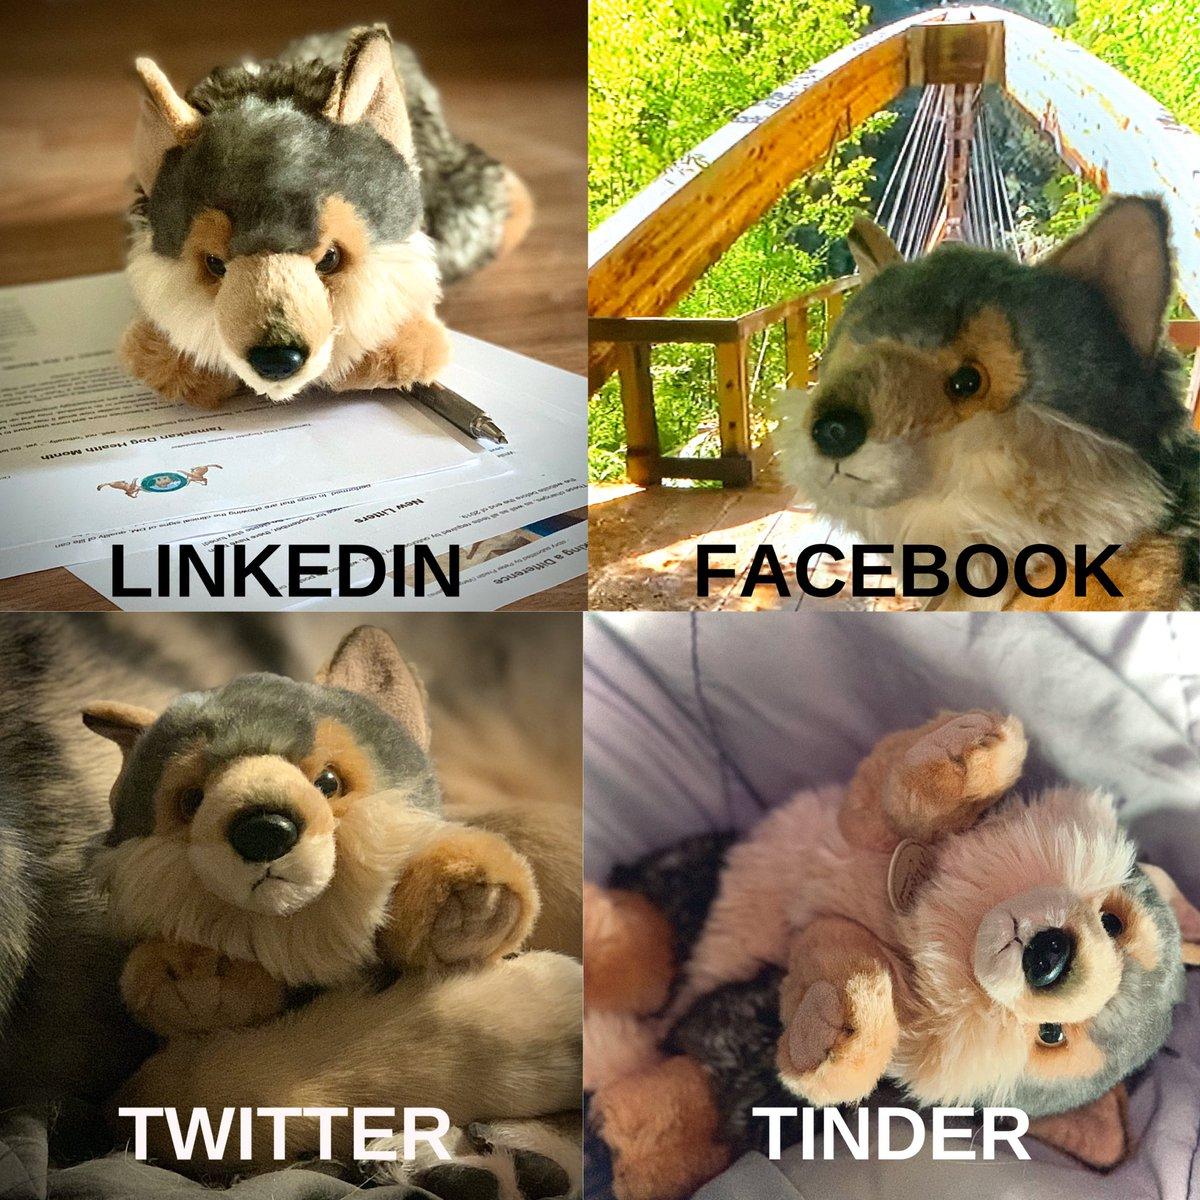 Here is our #DollyPartonChallenge Show is yours!#TDR #TamaskanDogRegister #TamaskanDog #Tamaskan #Dog #TamaskansOfTwitter #DogsOfTwitter #NotAWolf #WolfLookAlikeBreed #Fun #UnofficialMascot